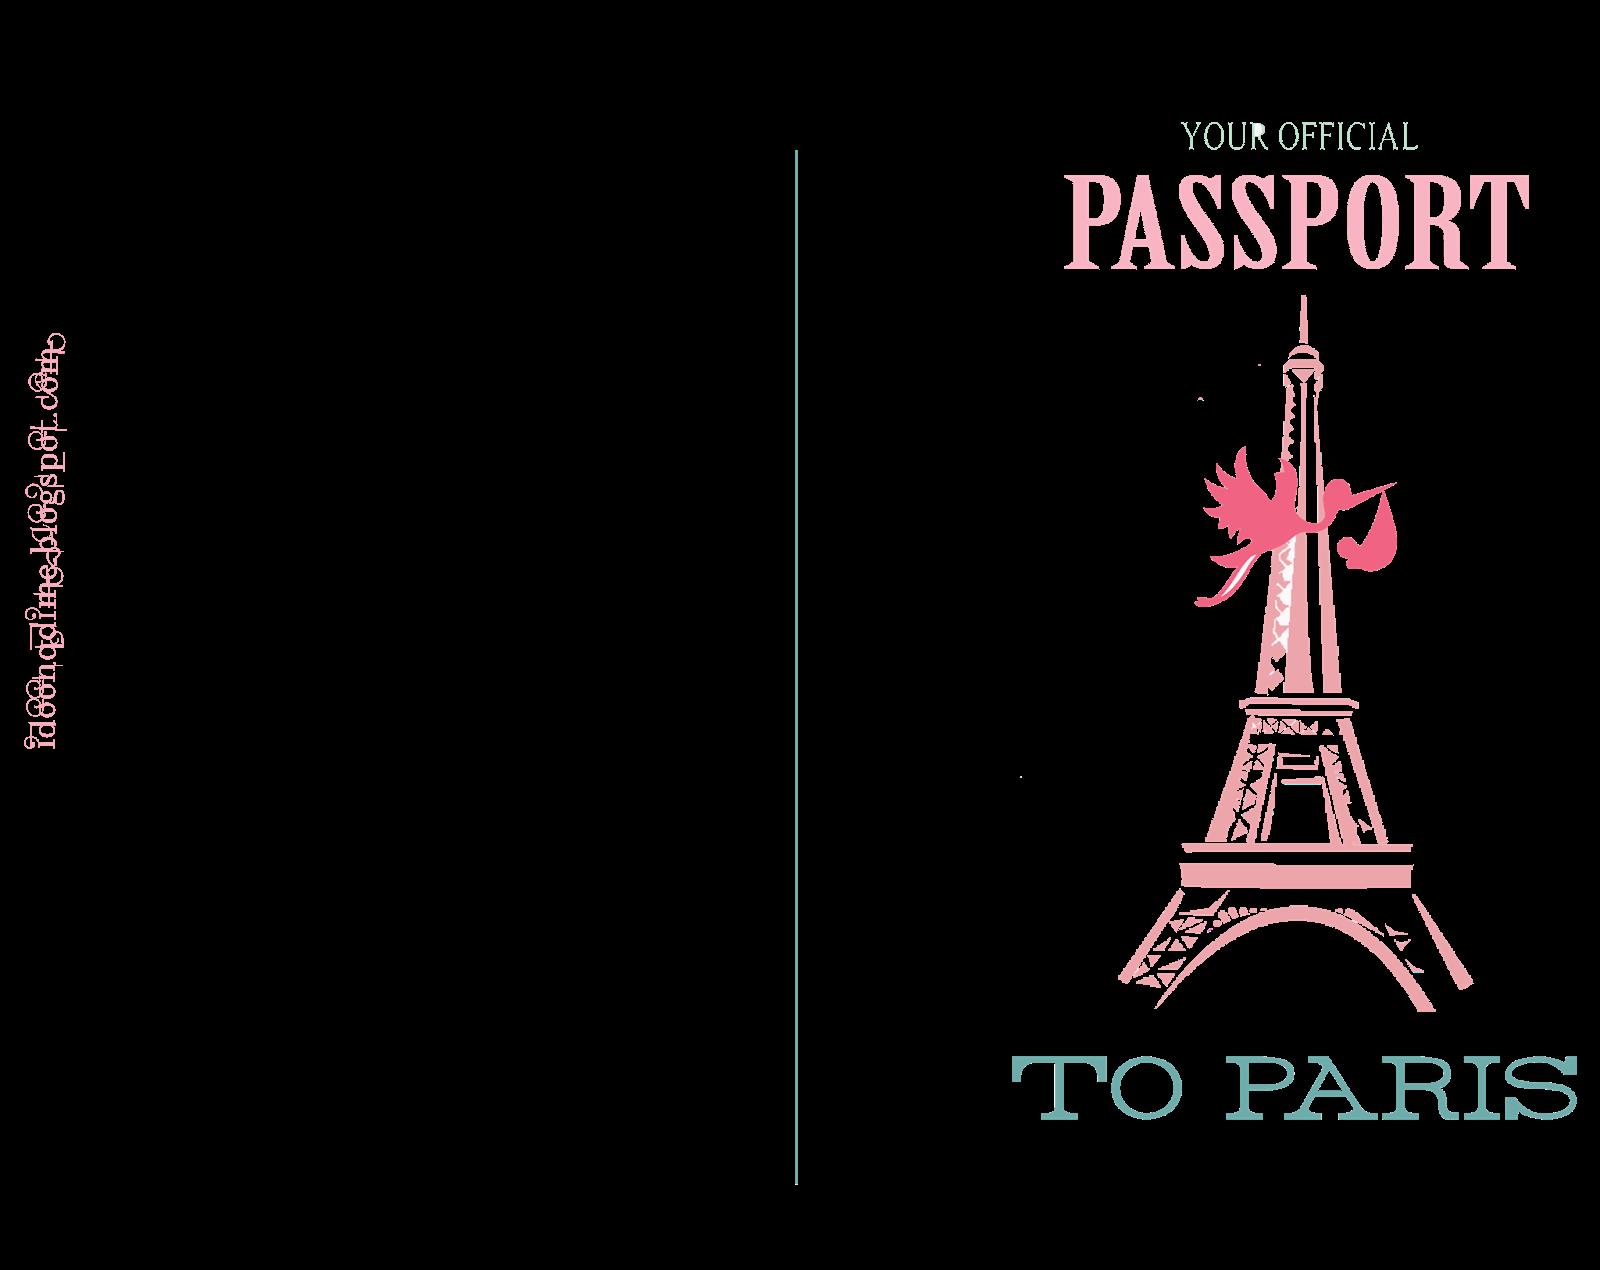 Passport Photo Template Free. i do on a dime free paris baby ...